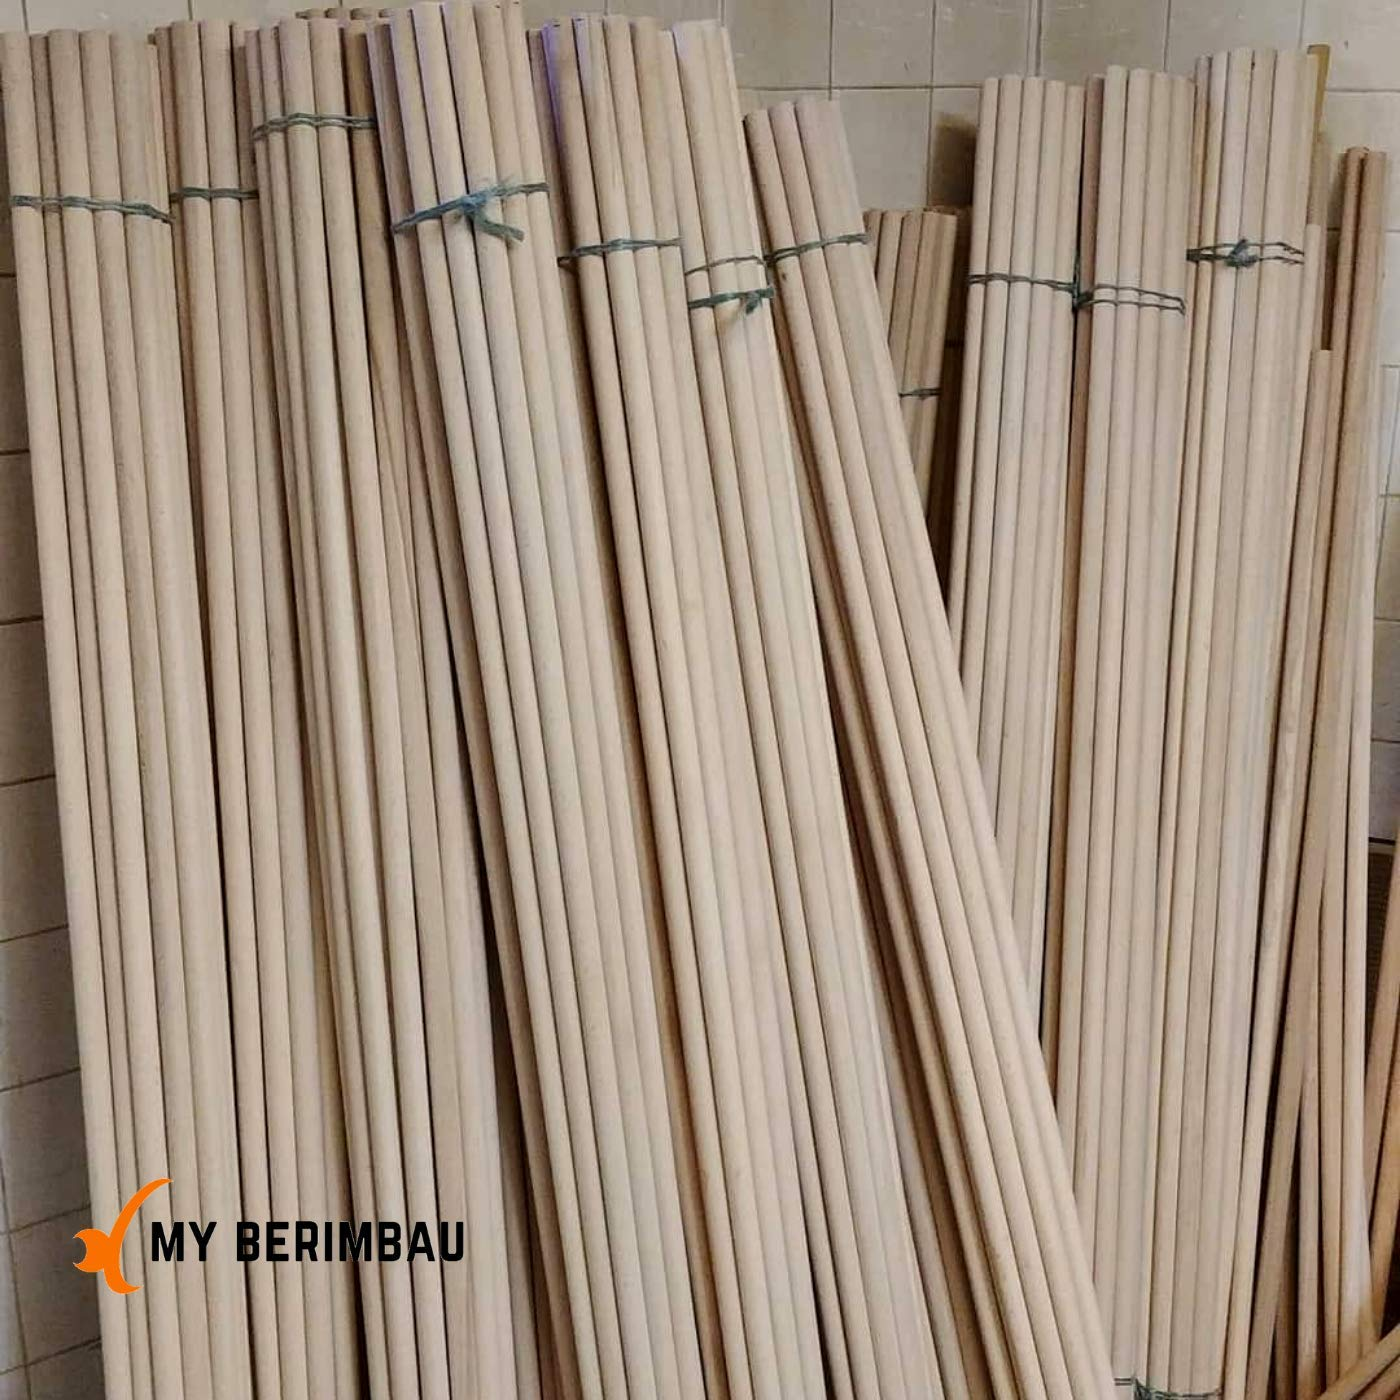 Verga raw material DIY Pack 20x pcs - Medio Size 155 cm